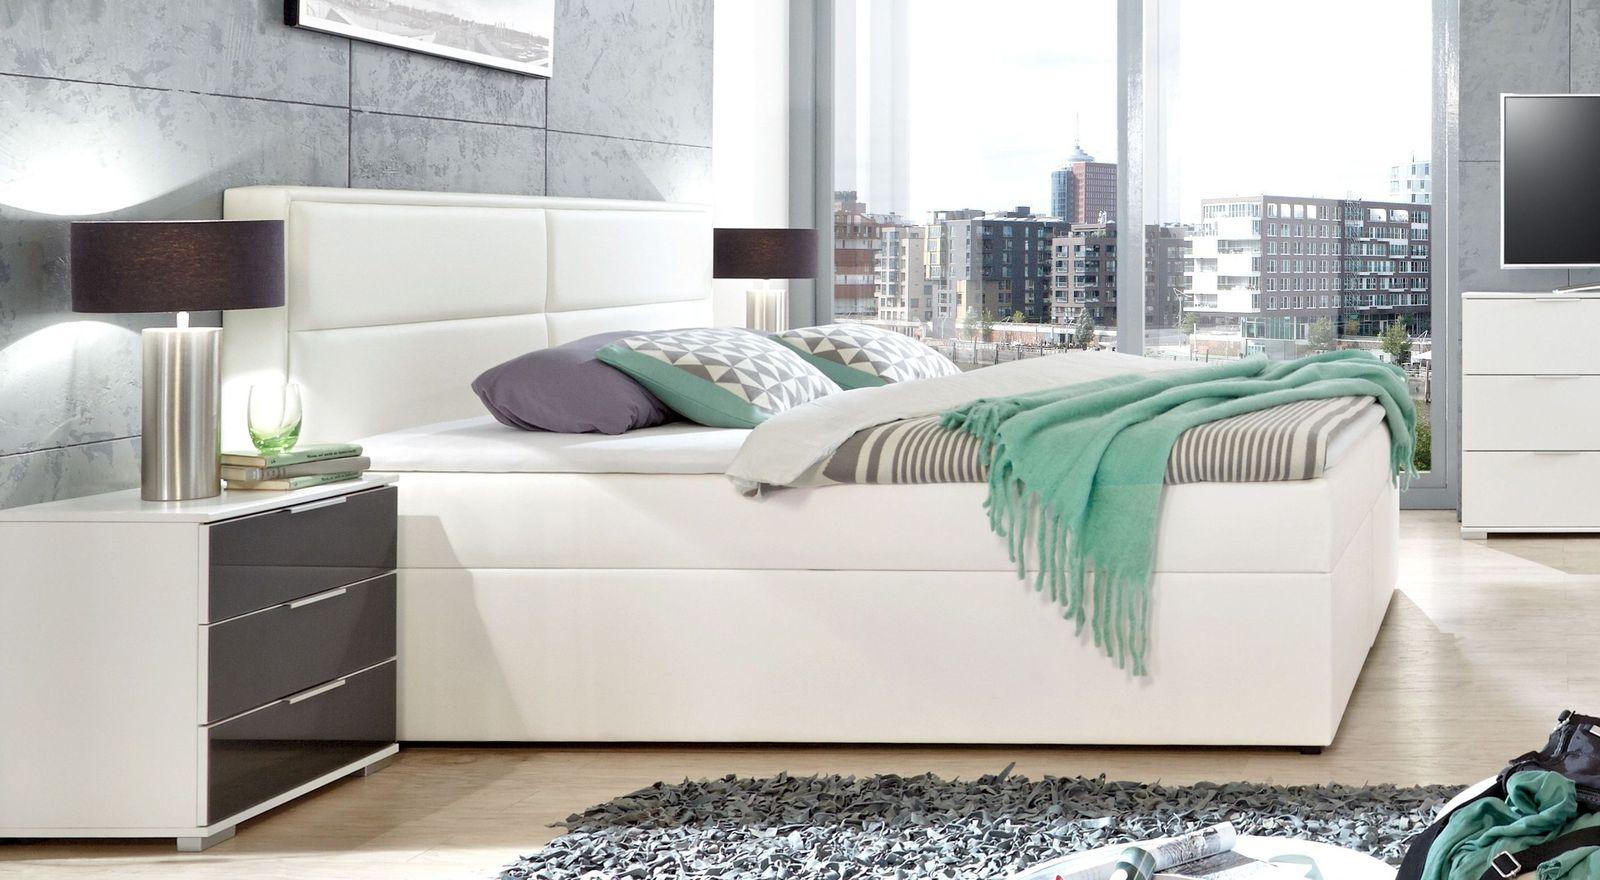 Boxbett Sinopoli mit weißem Kunstleder Bezug